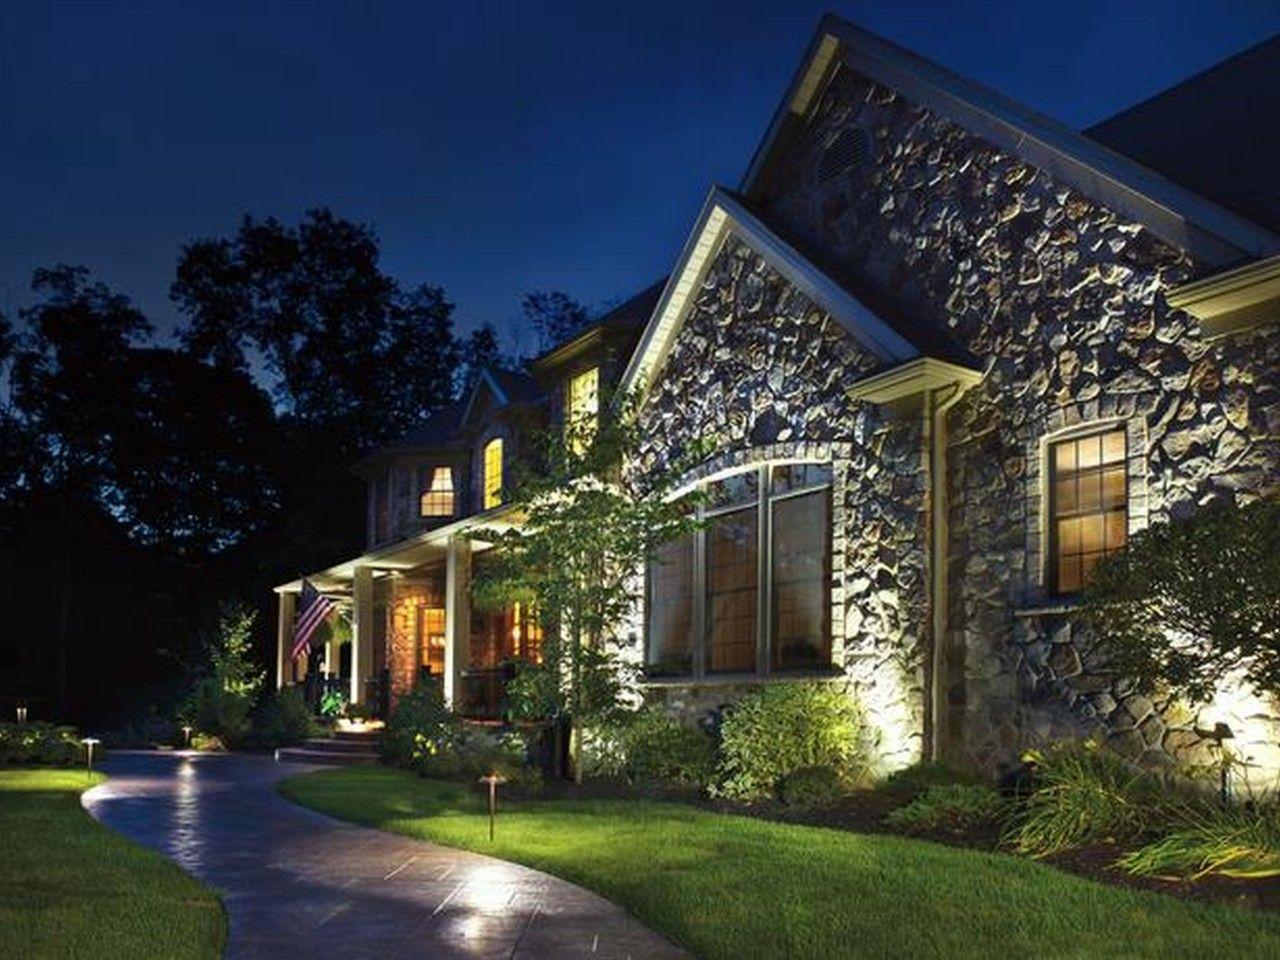 landscaping lighting ideas for front yard bathroom design 2017